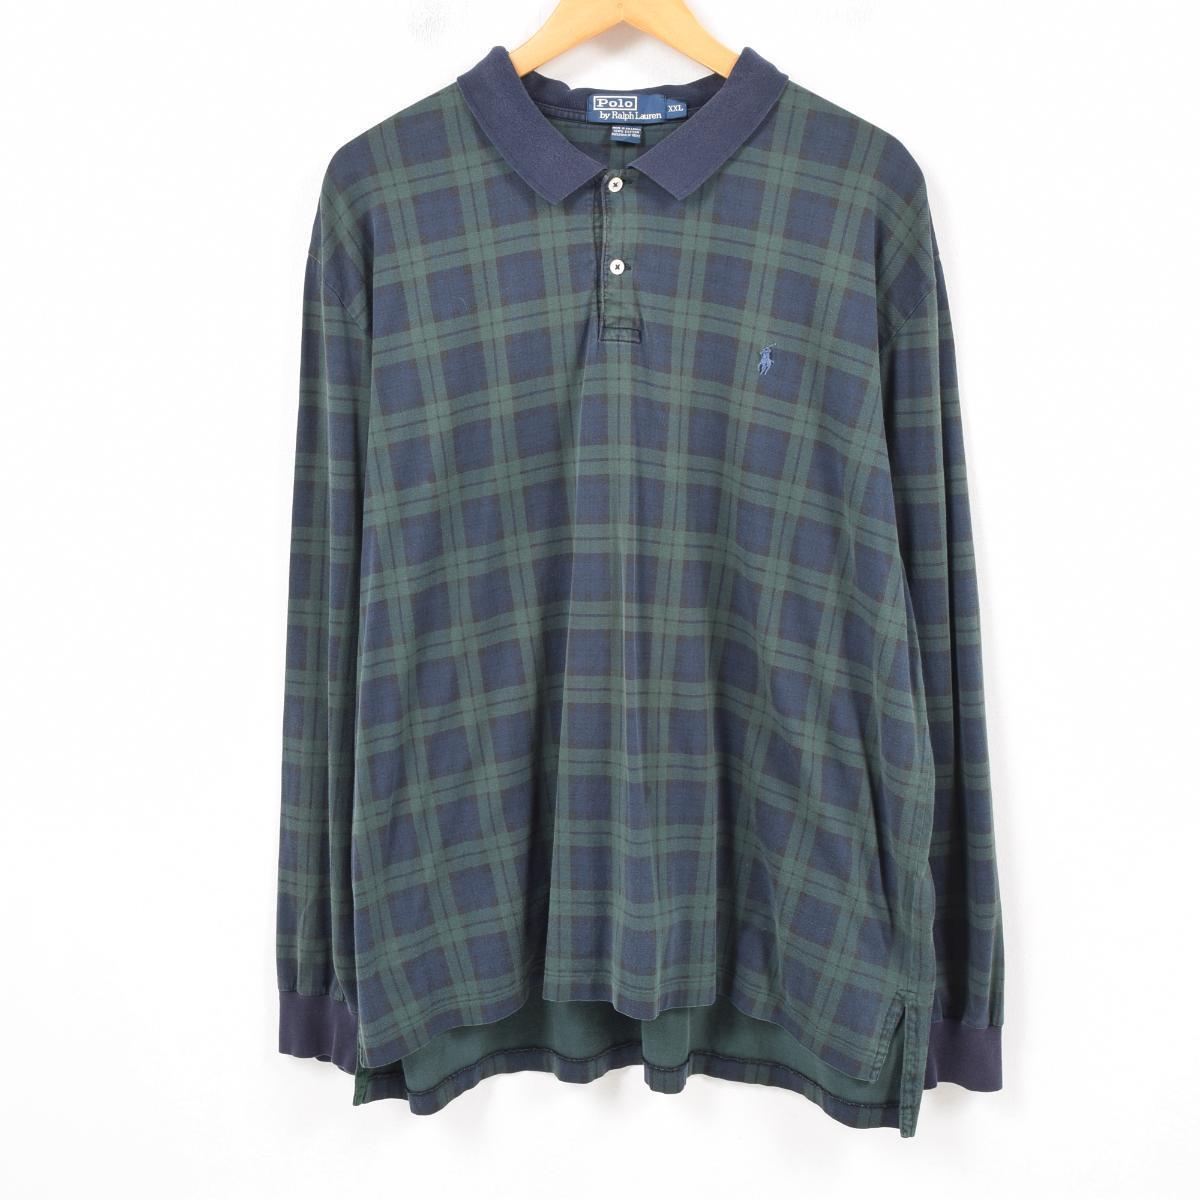 Polo Xxl Lauren Watch Shirt Ralph Long By Black Sleeves Wau8721 Check Men vN8nwPy0Om